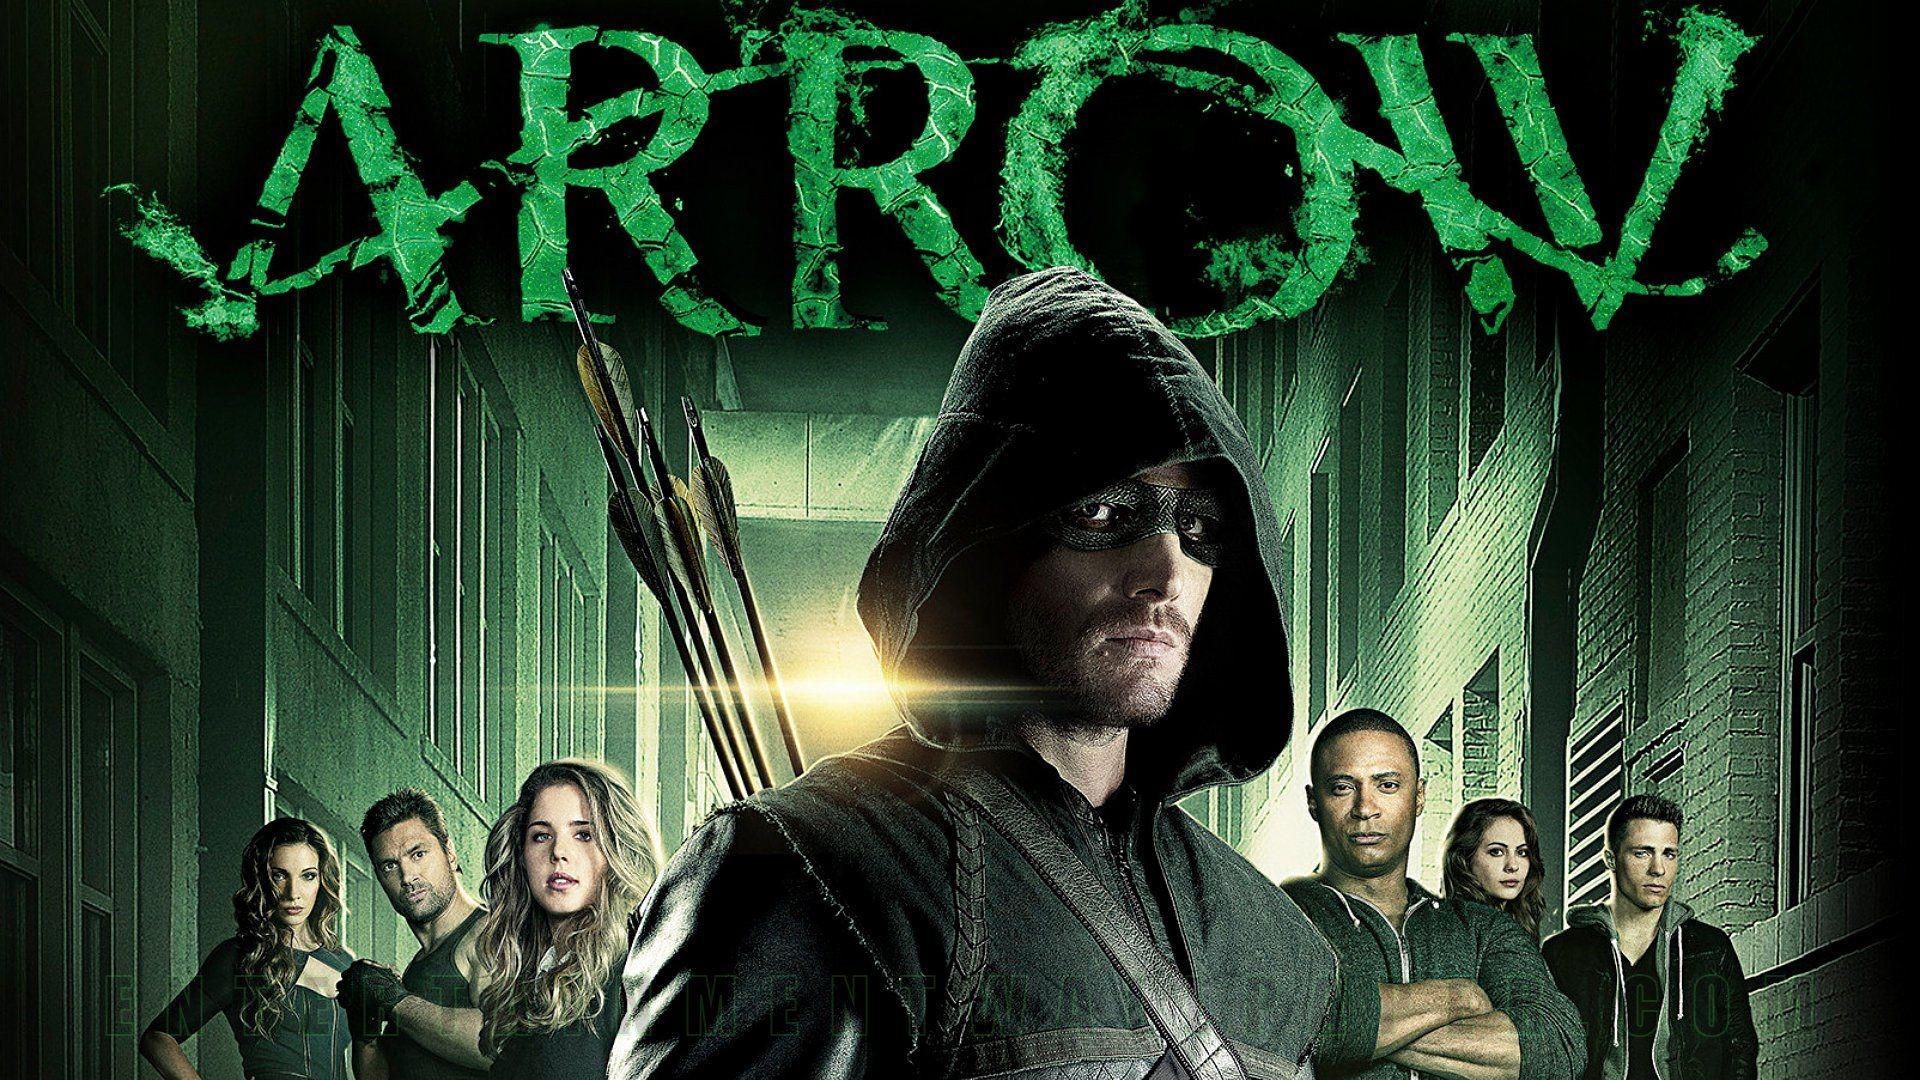 Arrow images